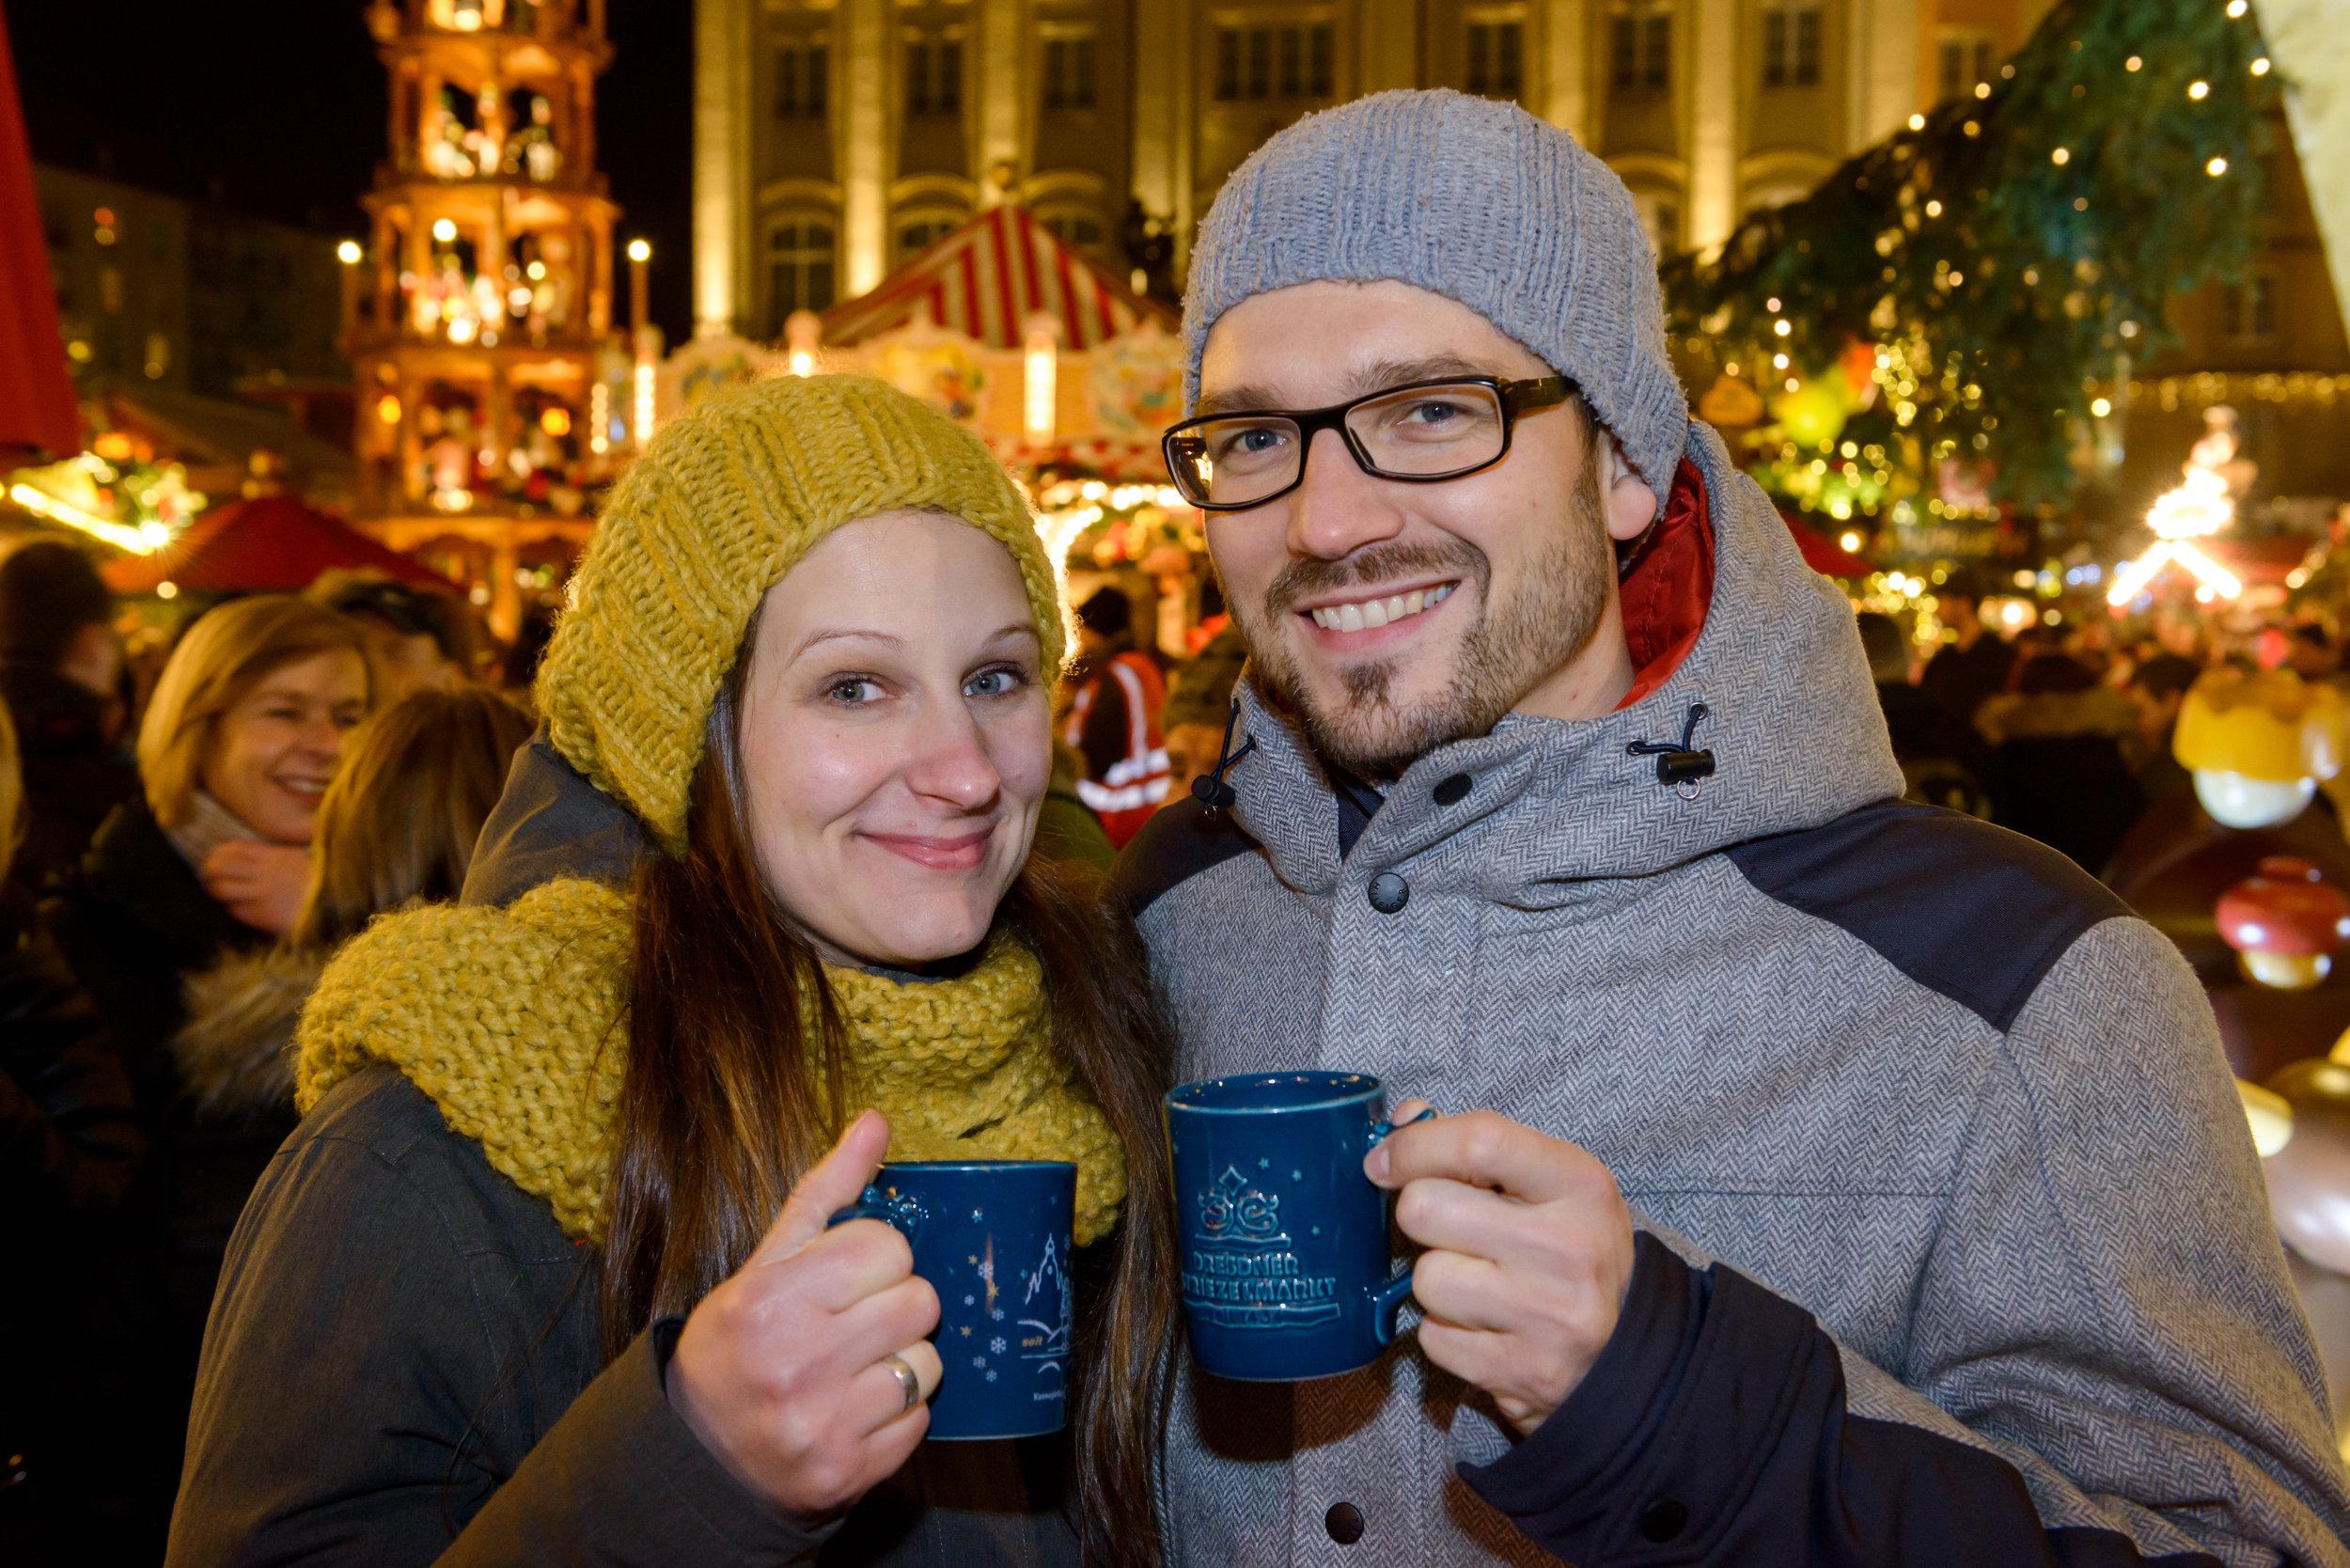 Enjoying Wine at the Christmas Market | Photo Credit: Landeshauptstadt Dresden/Frank Grätz